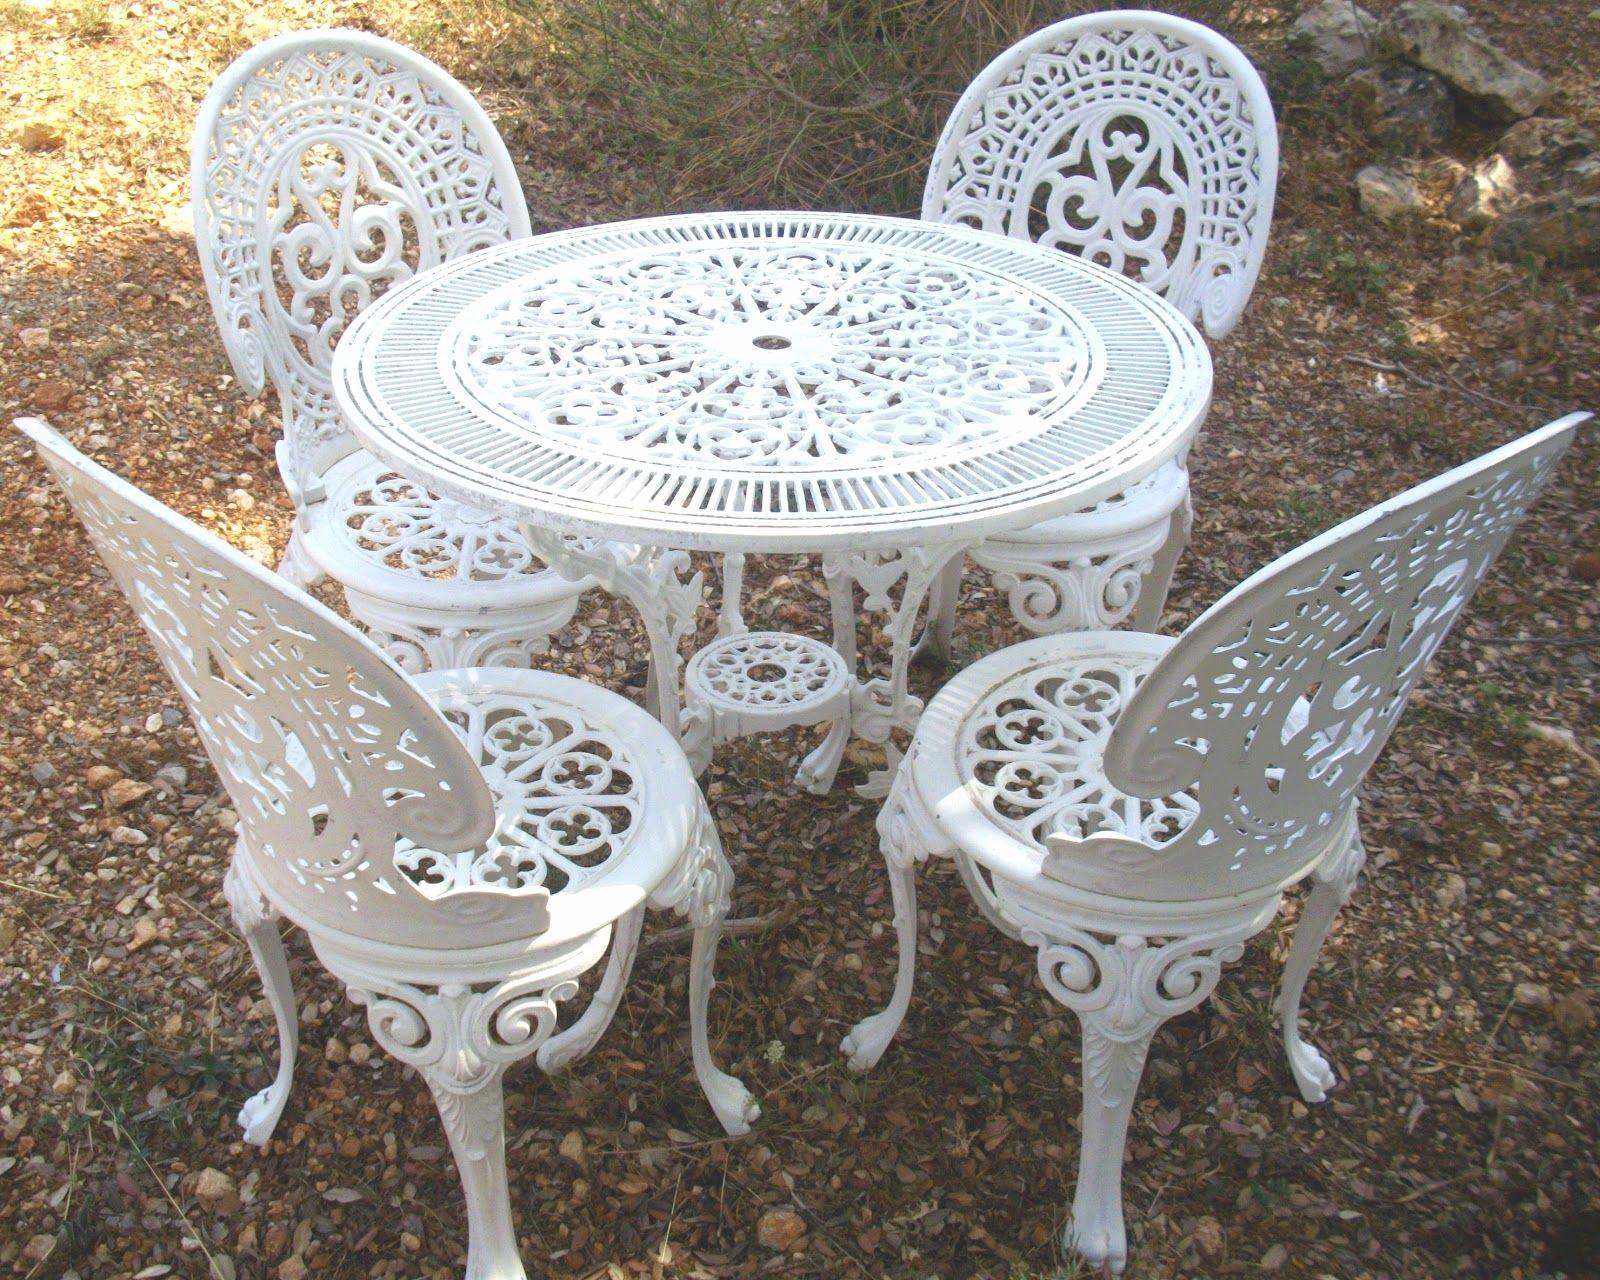 Chaise De Jardin Aluminium Archives - Luckytroll concernant Salon De Jardin En Fer Forgé